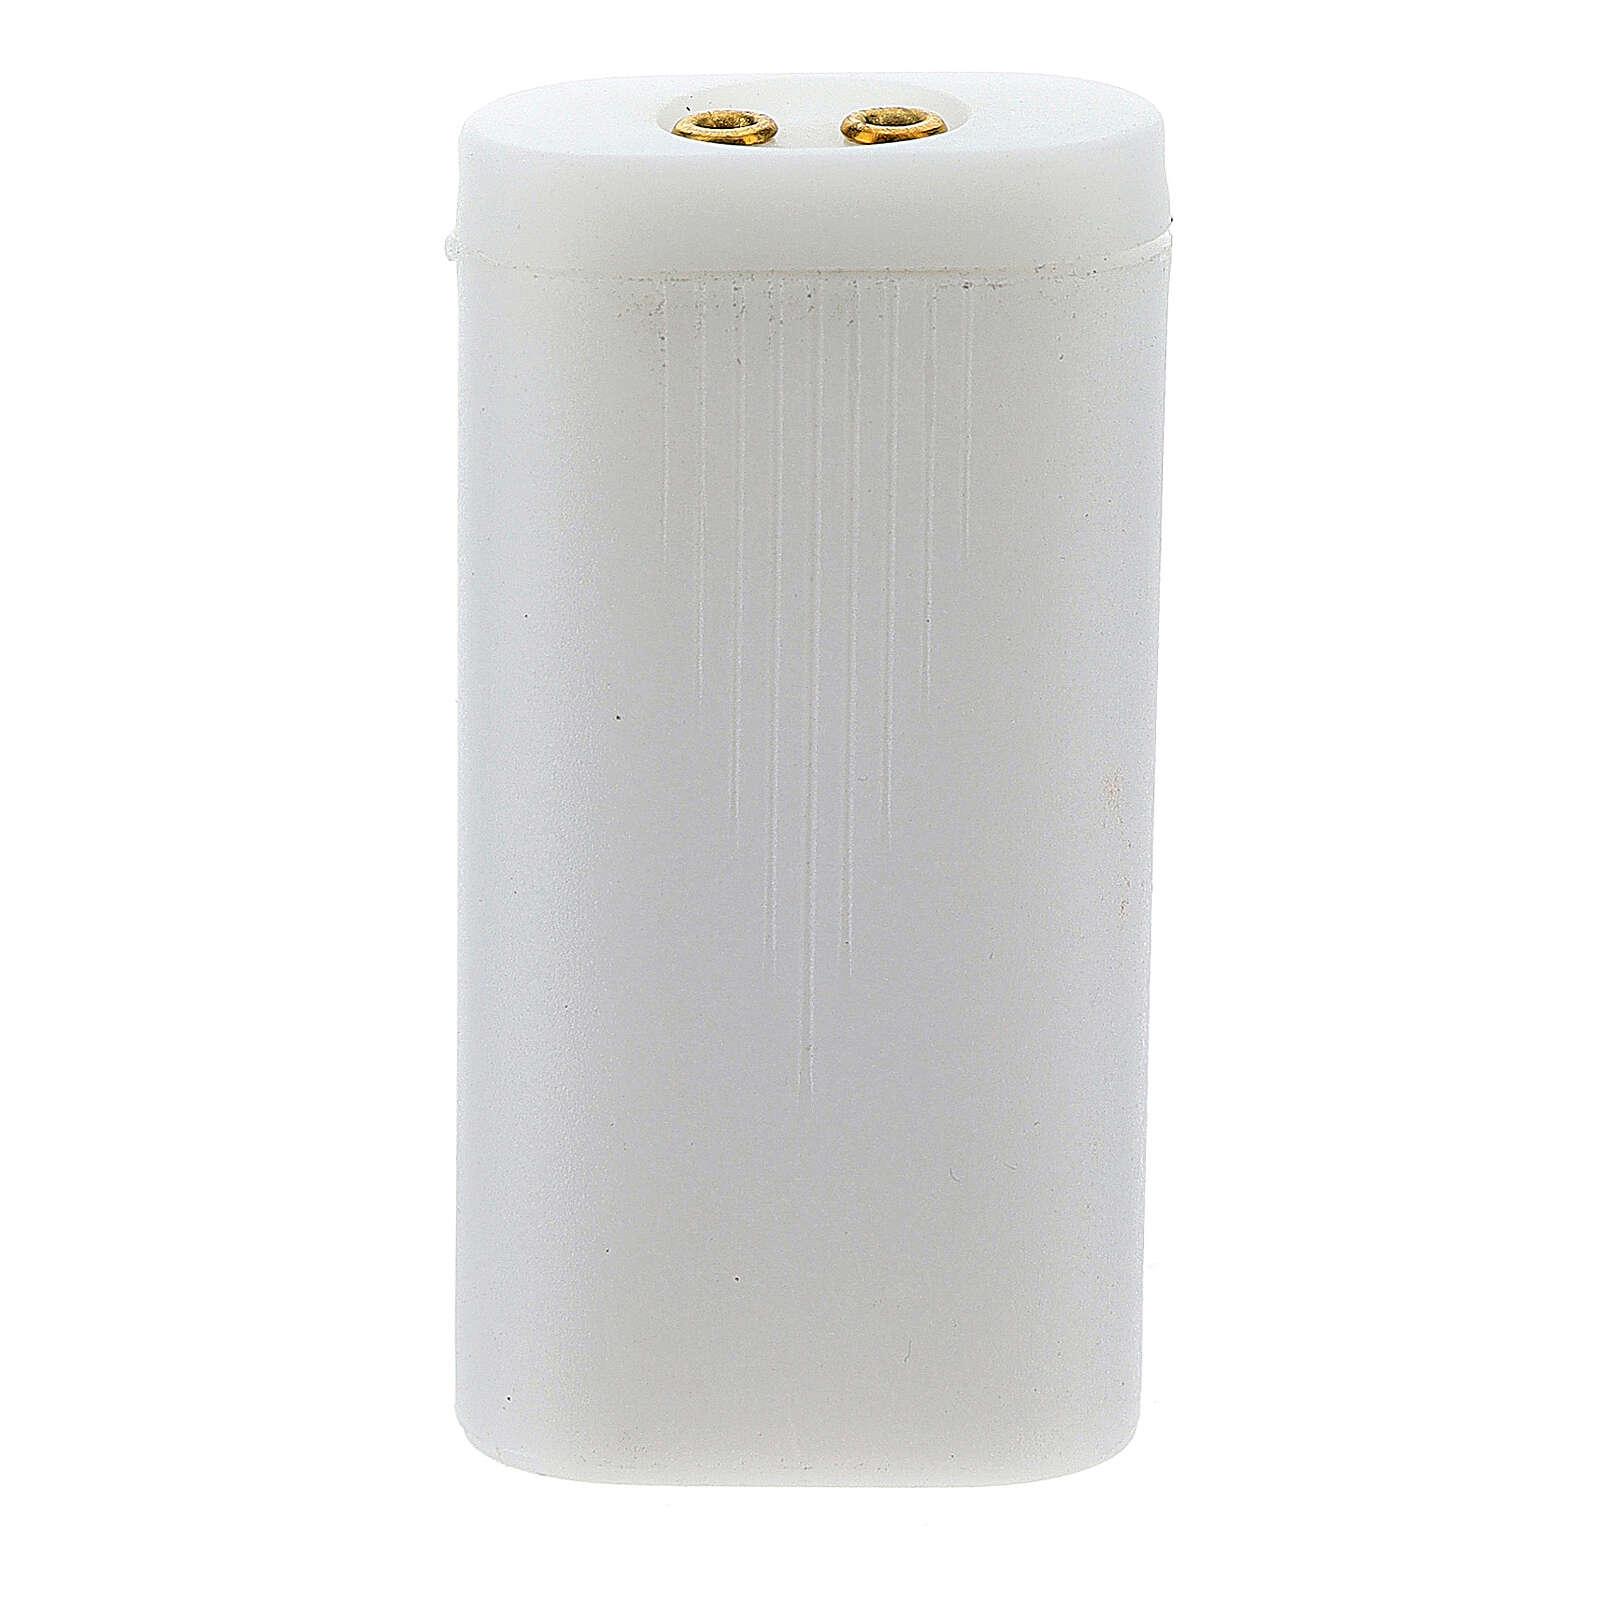 Nativity accessory, battery holder for nativity light 4